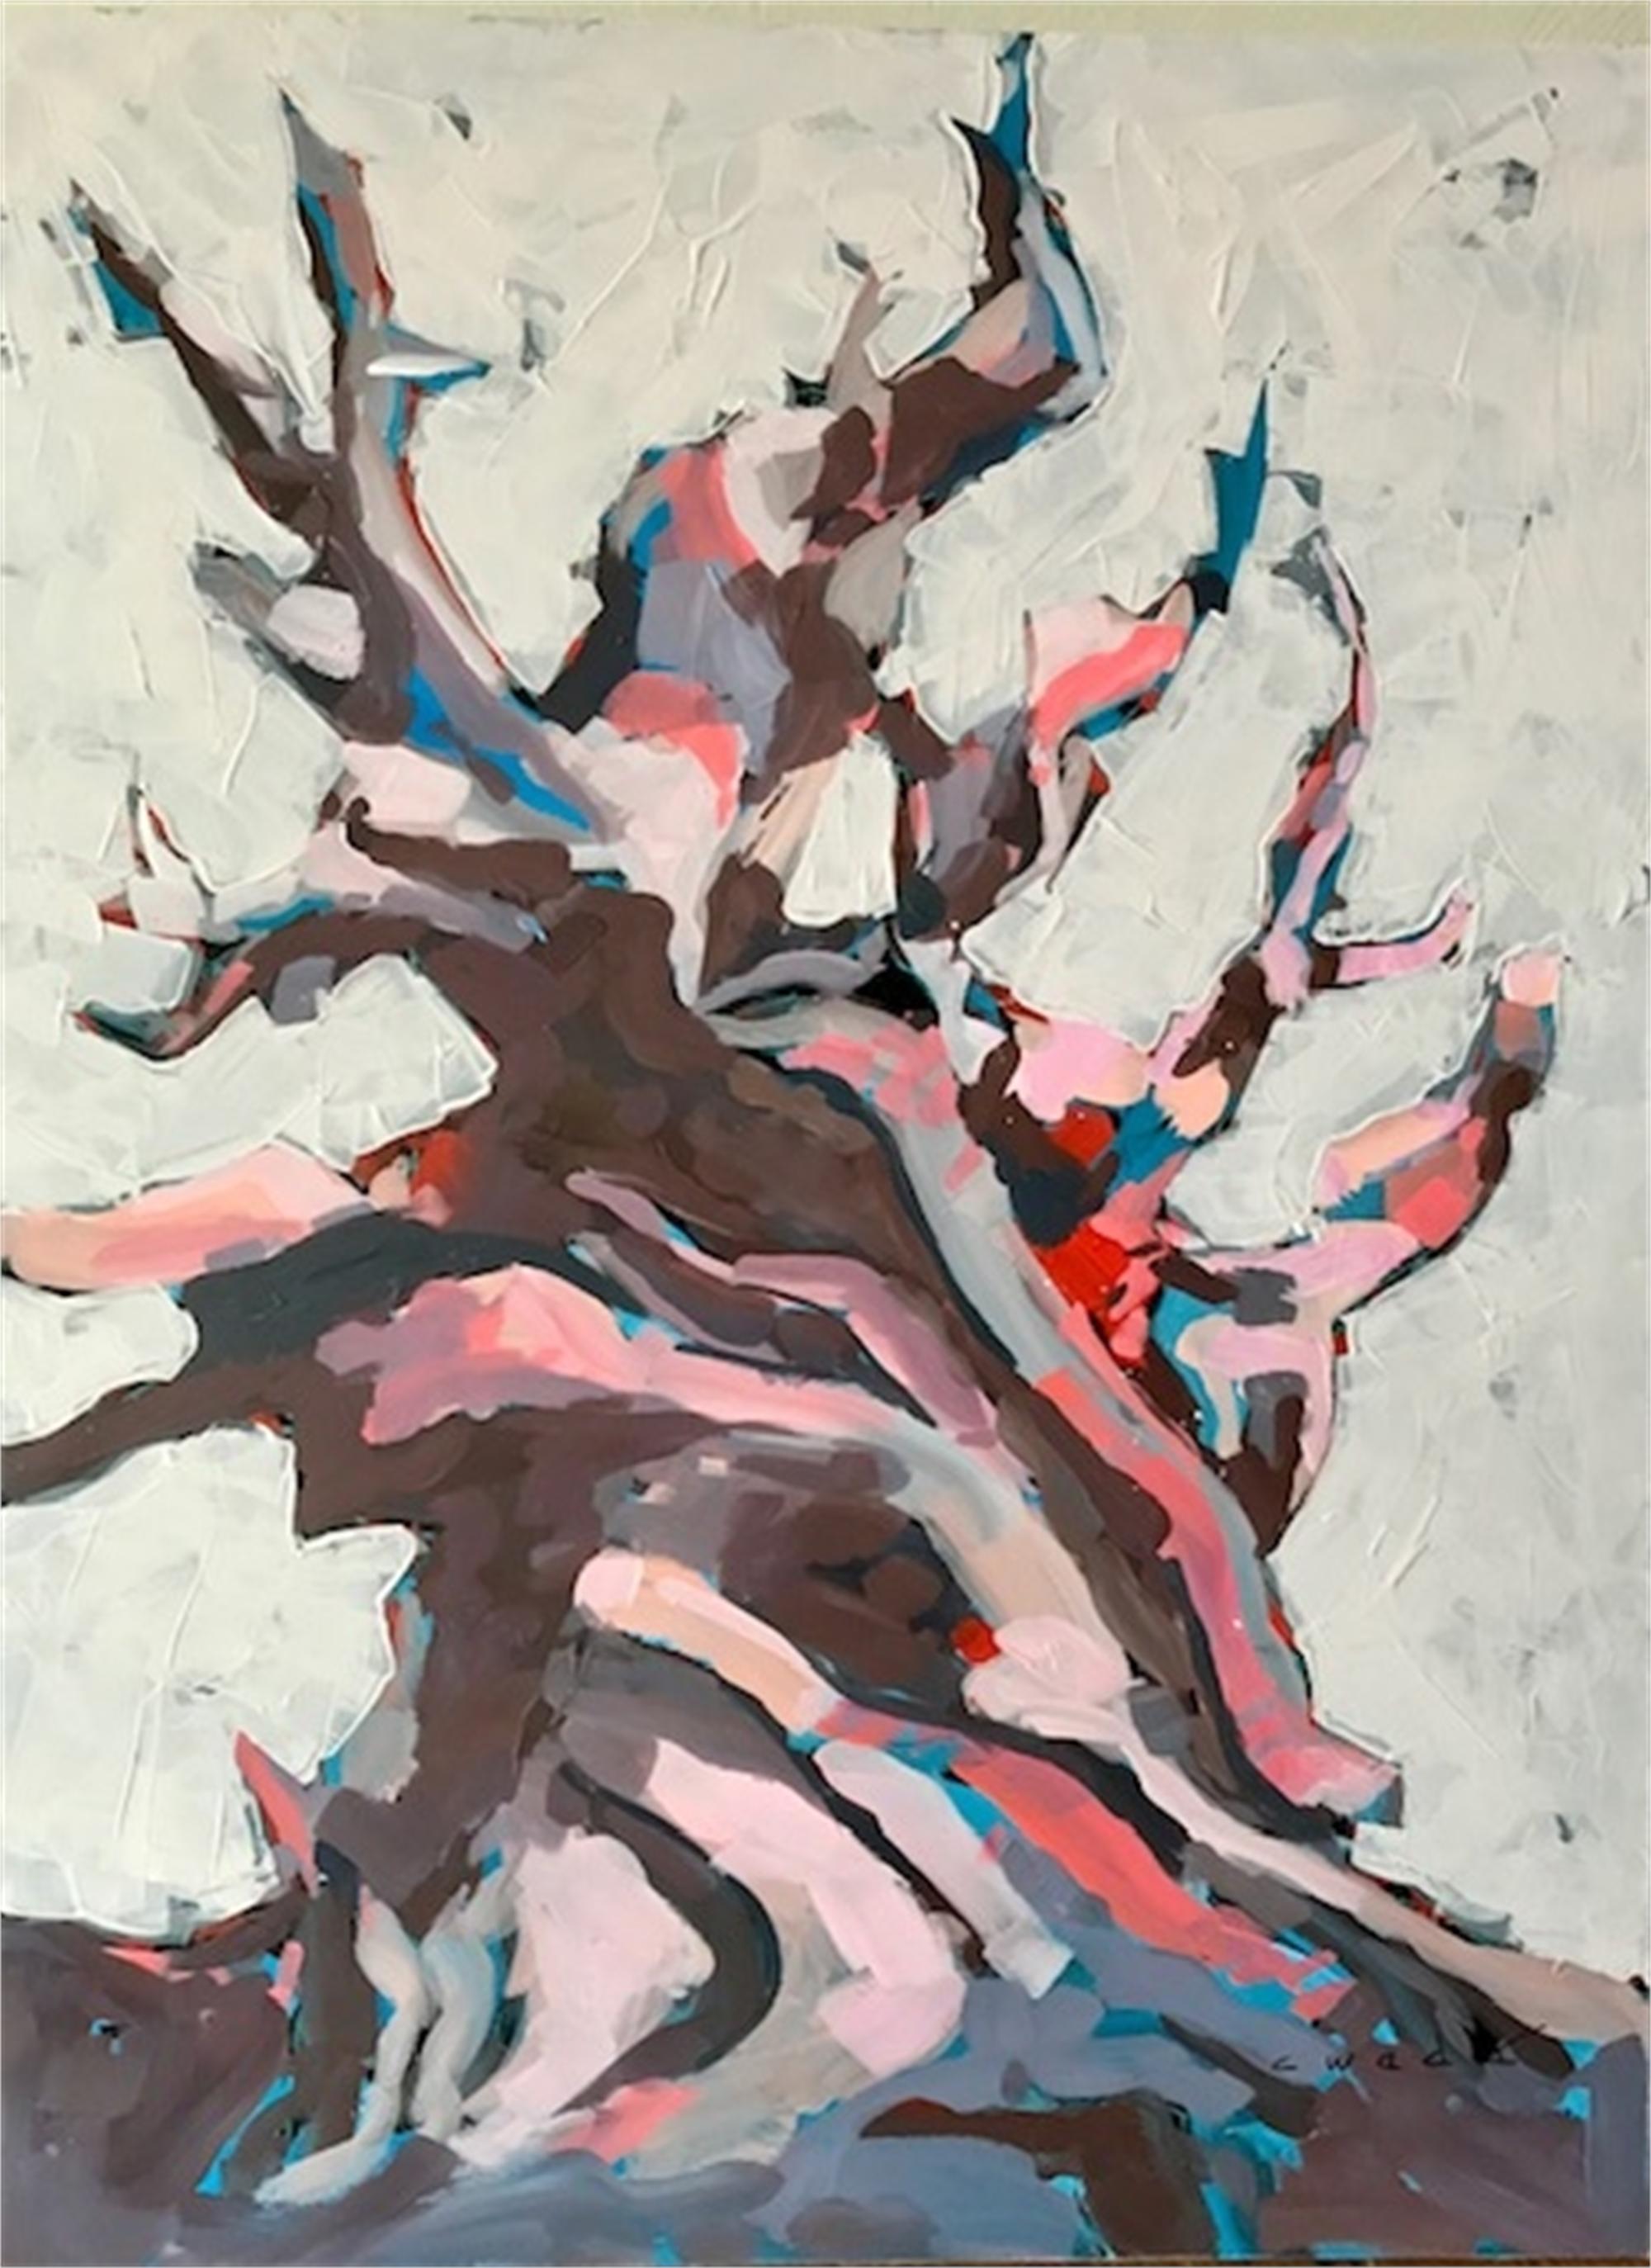 Bristlecone Pine #6 by Carole Wade